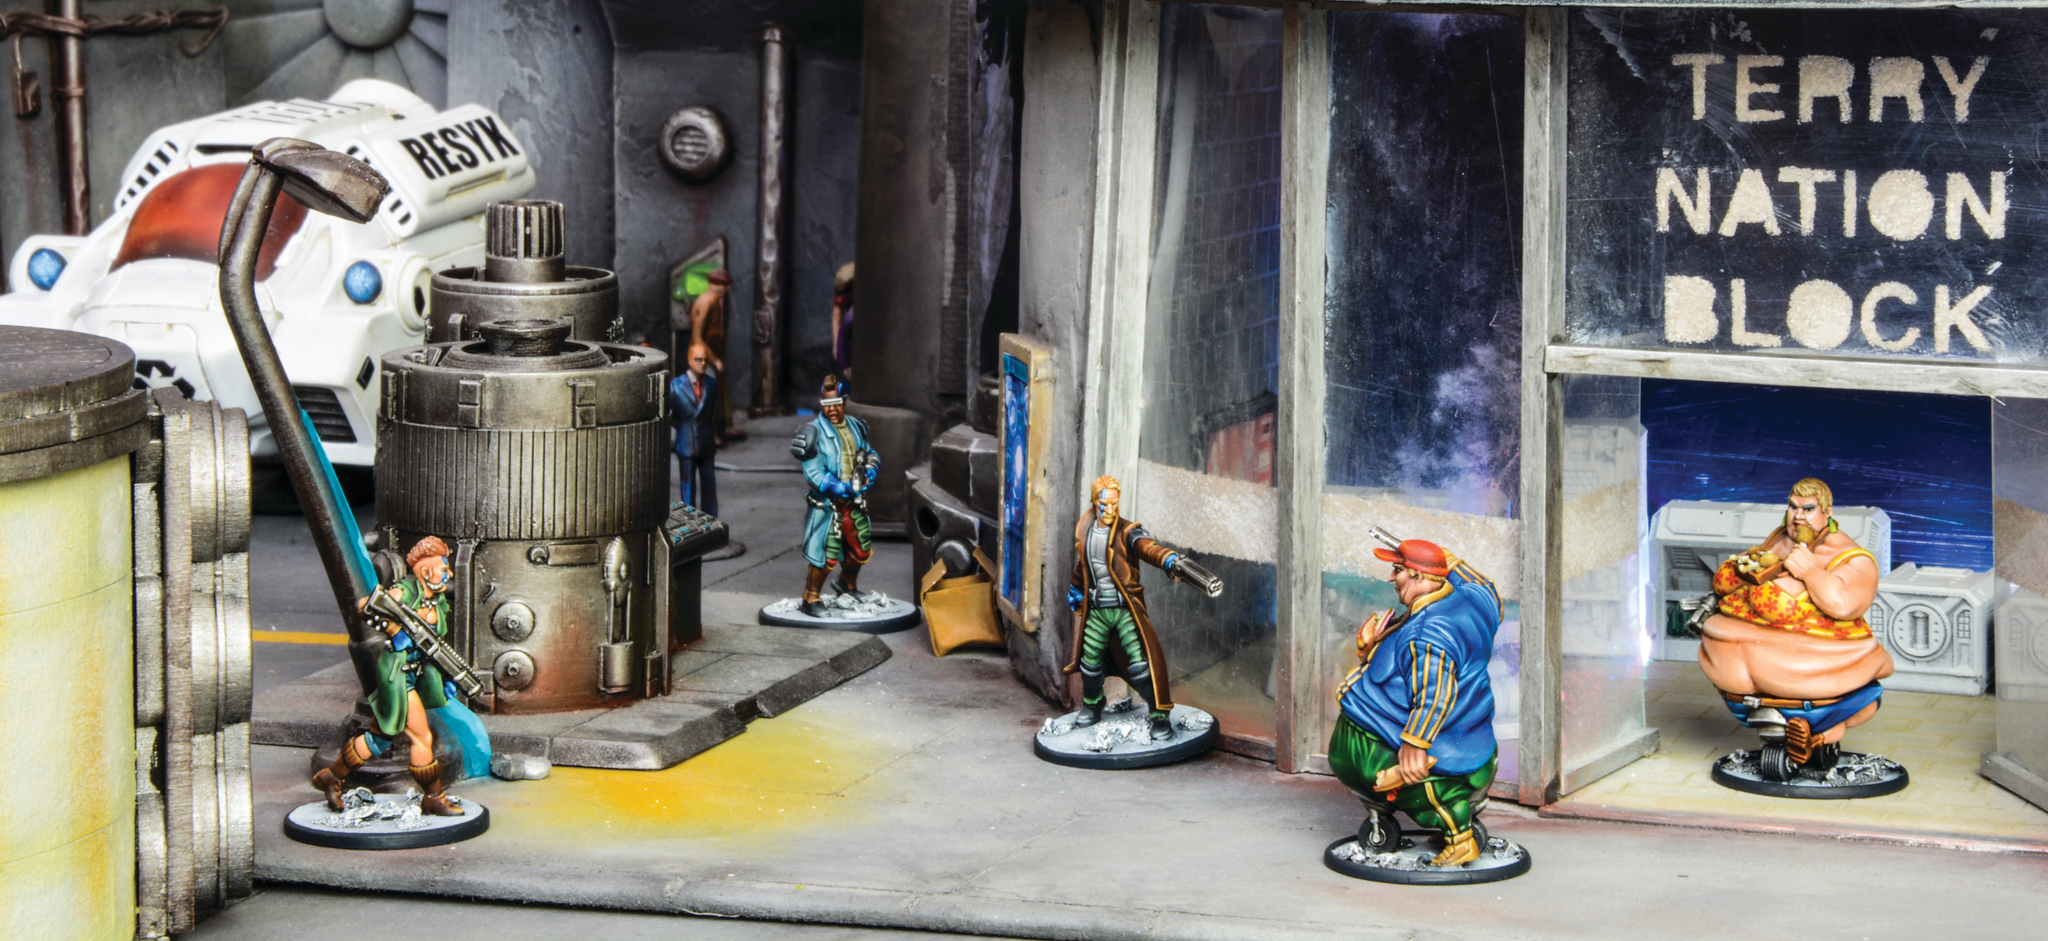 League of Fatties face a Block Gang